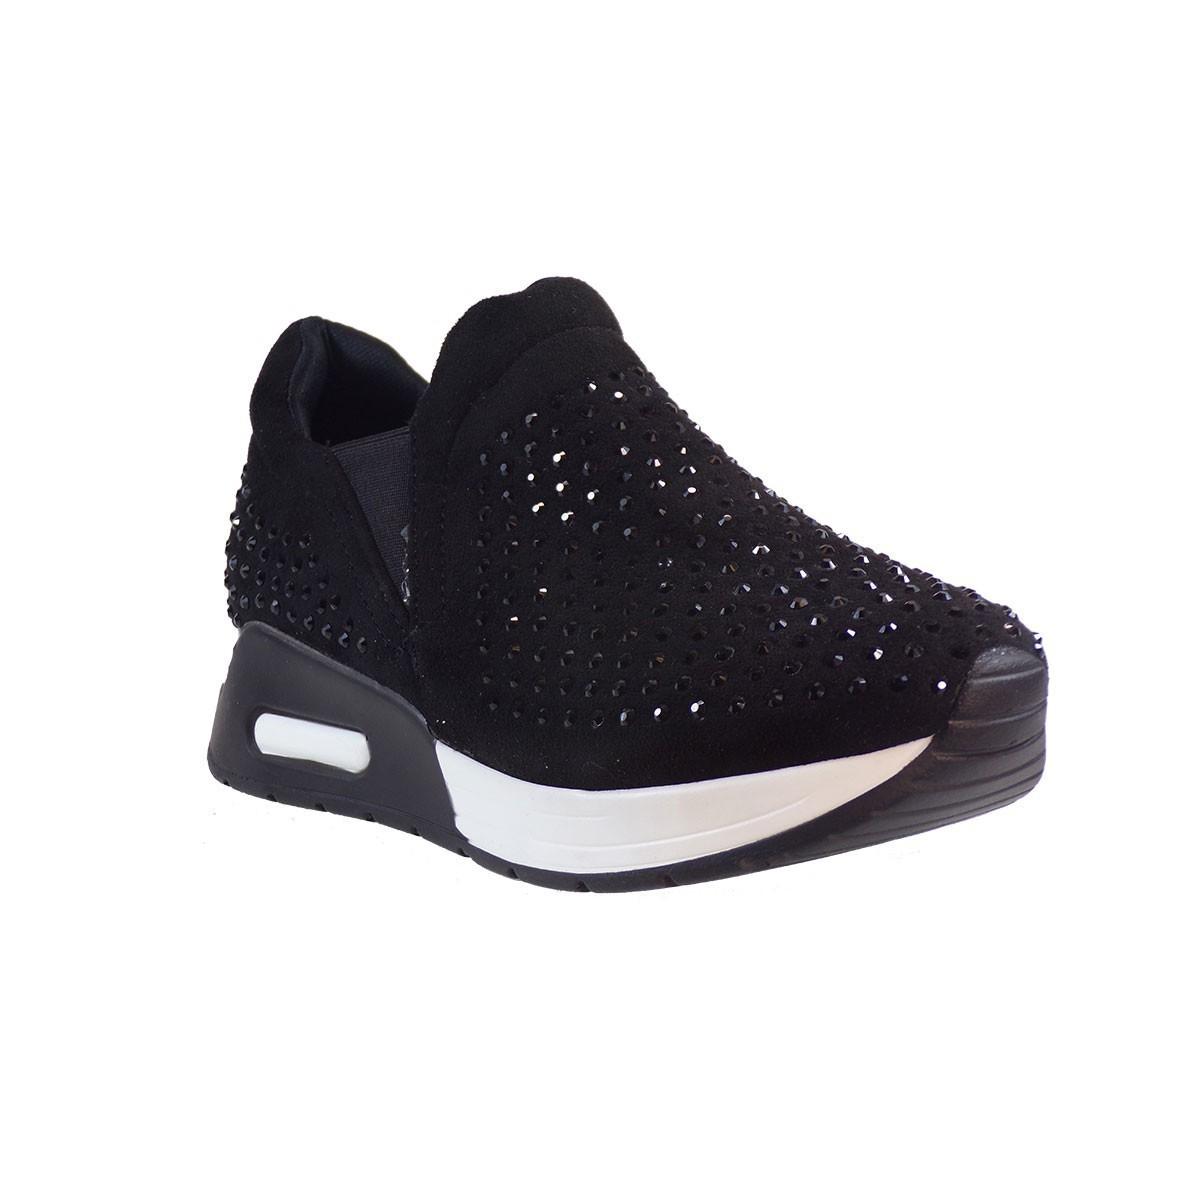 Bagiota shoes Sneakers Παπούτσια Γυναικεία DF3367 Μαύρο  54d0330d62b